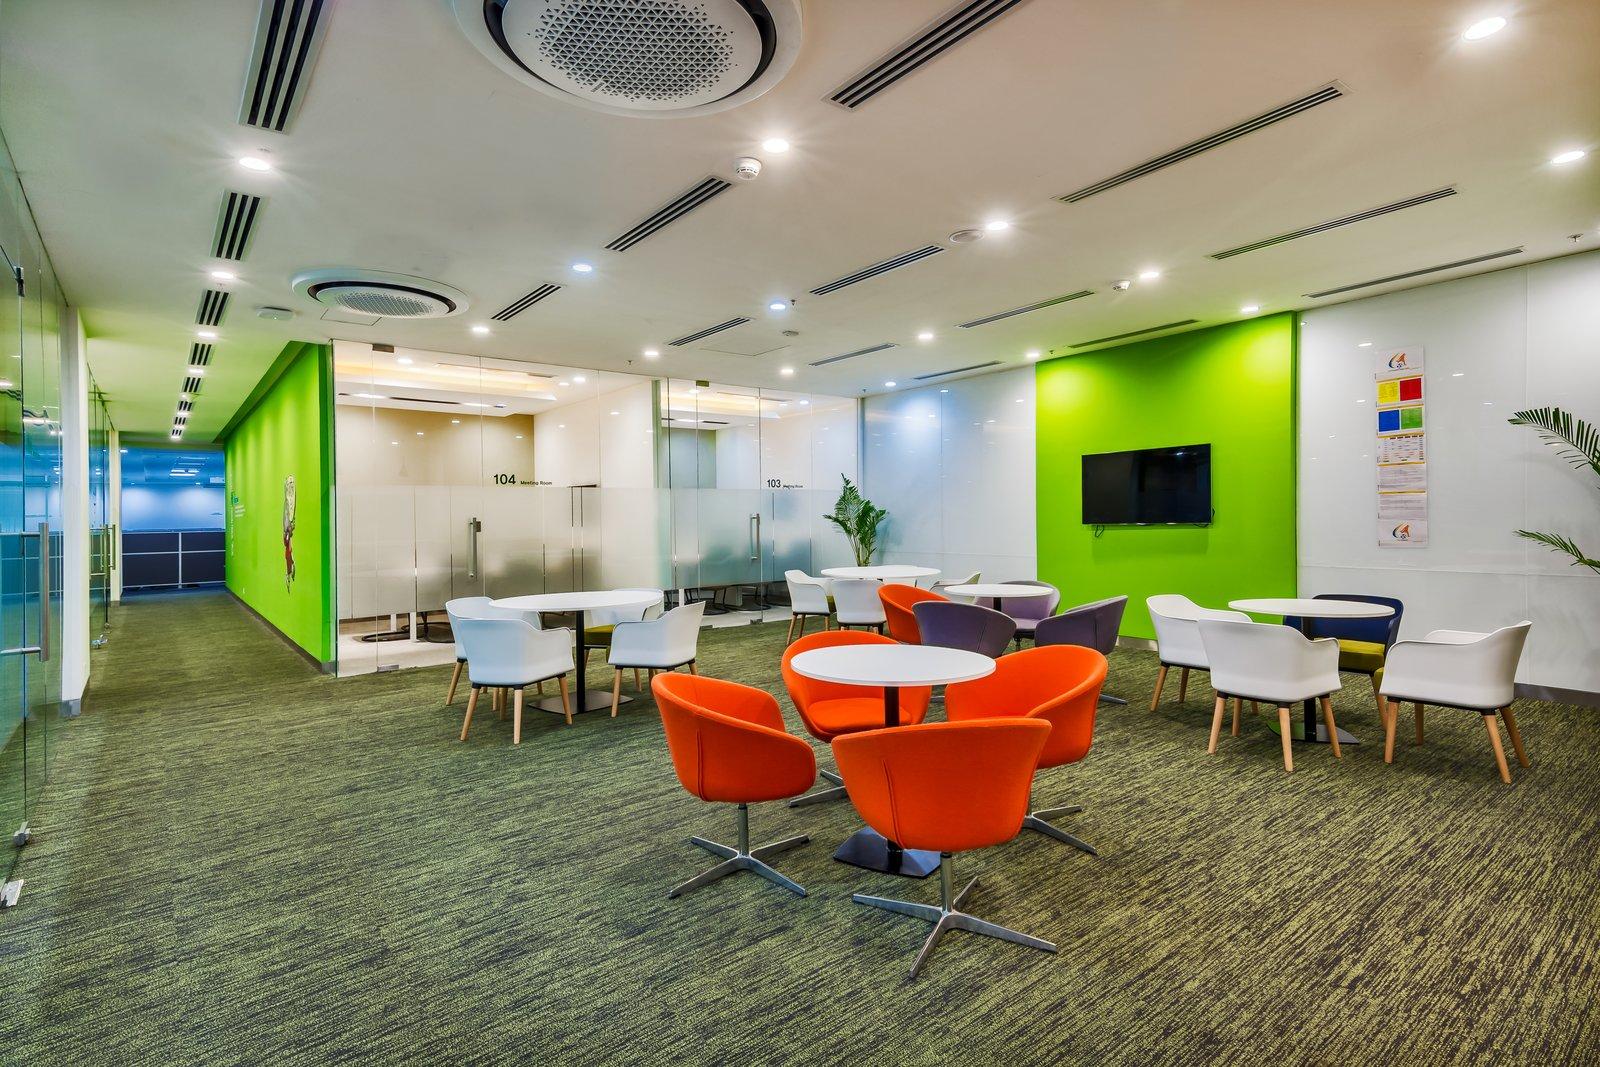 Design office space designing Pinterest Office Space Designing Essentials Spacesworks Office Space Designing Essentials Dwell